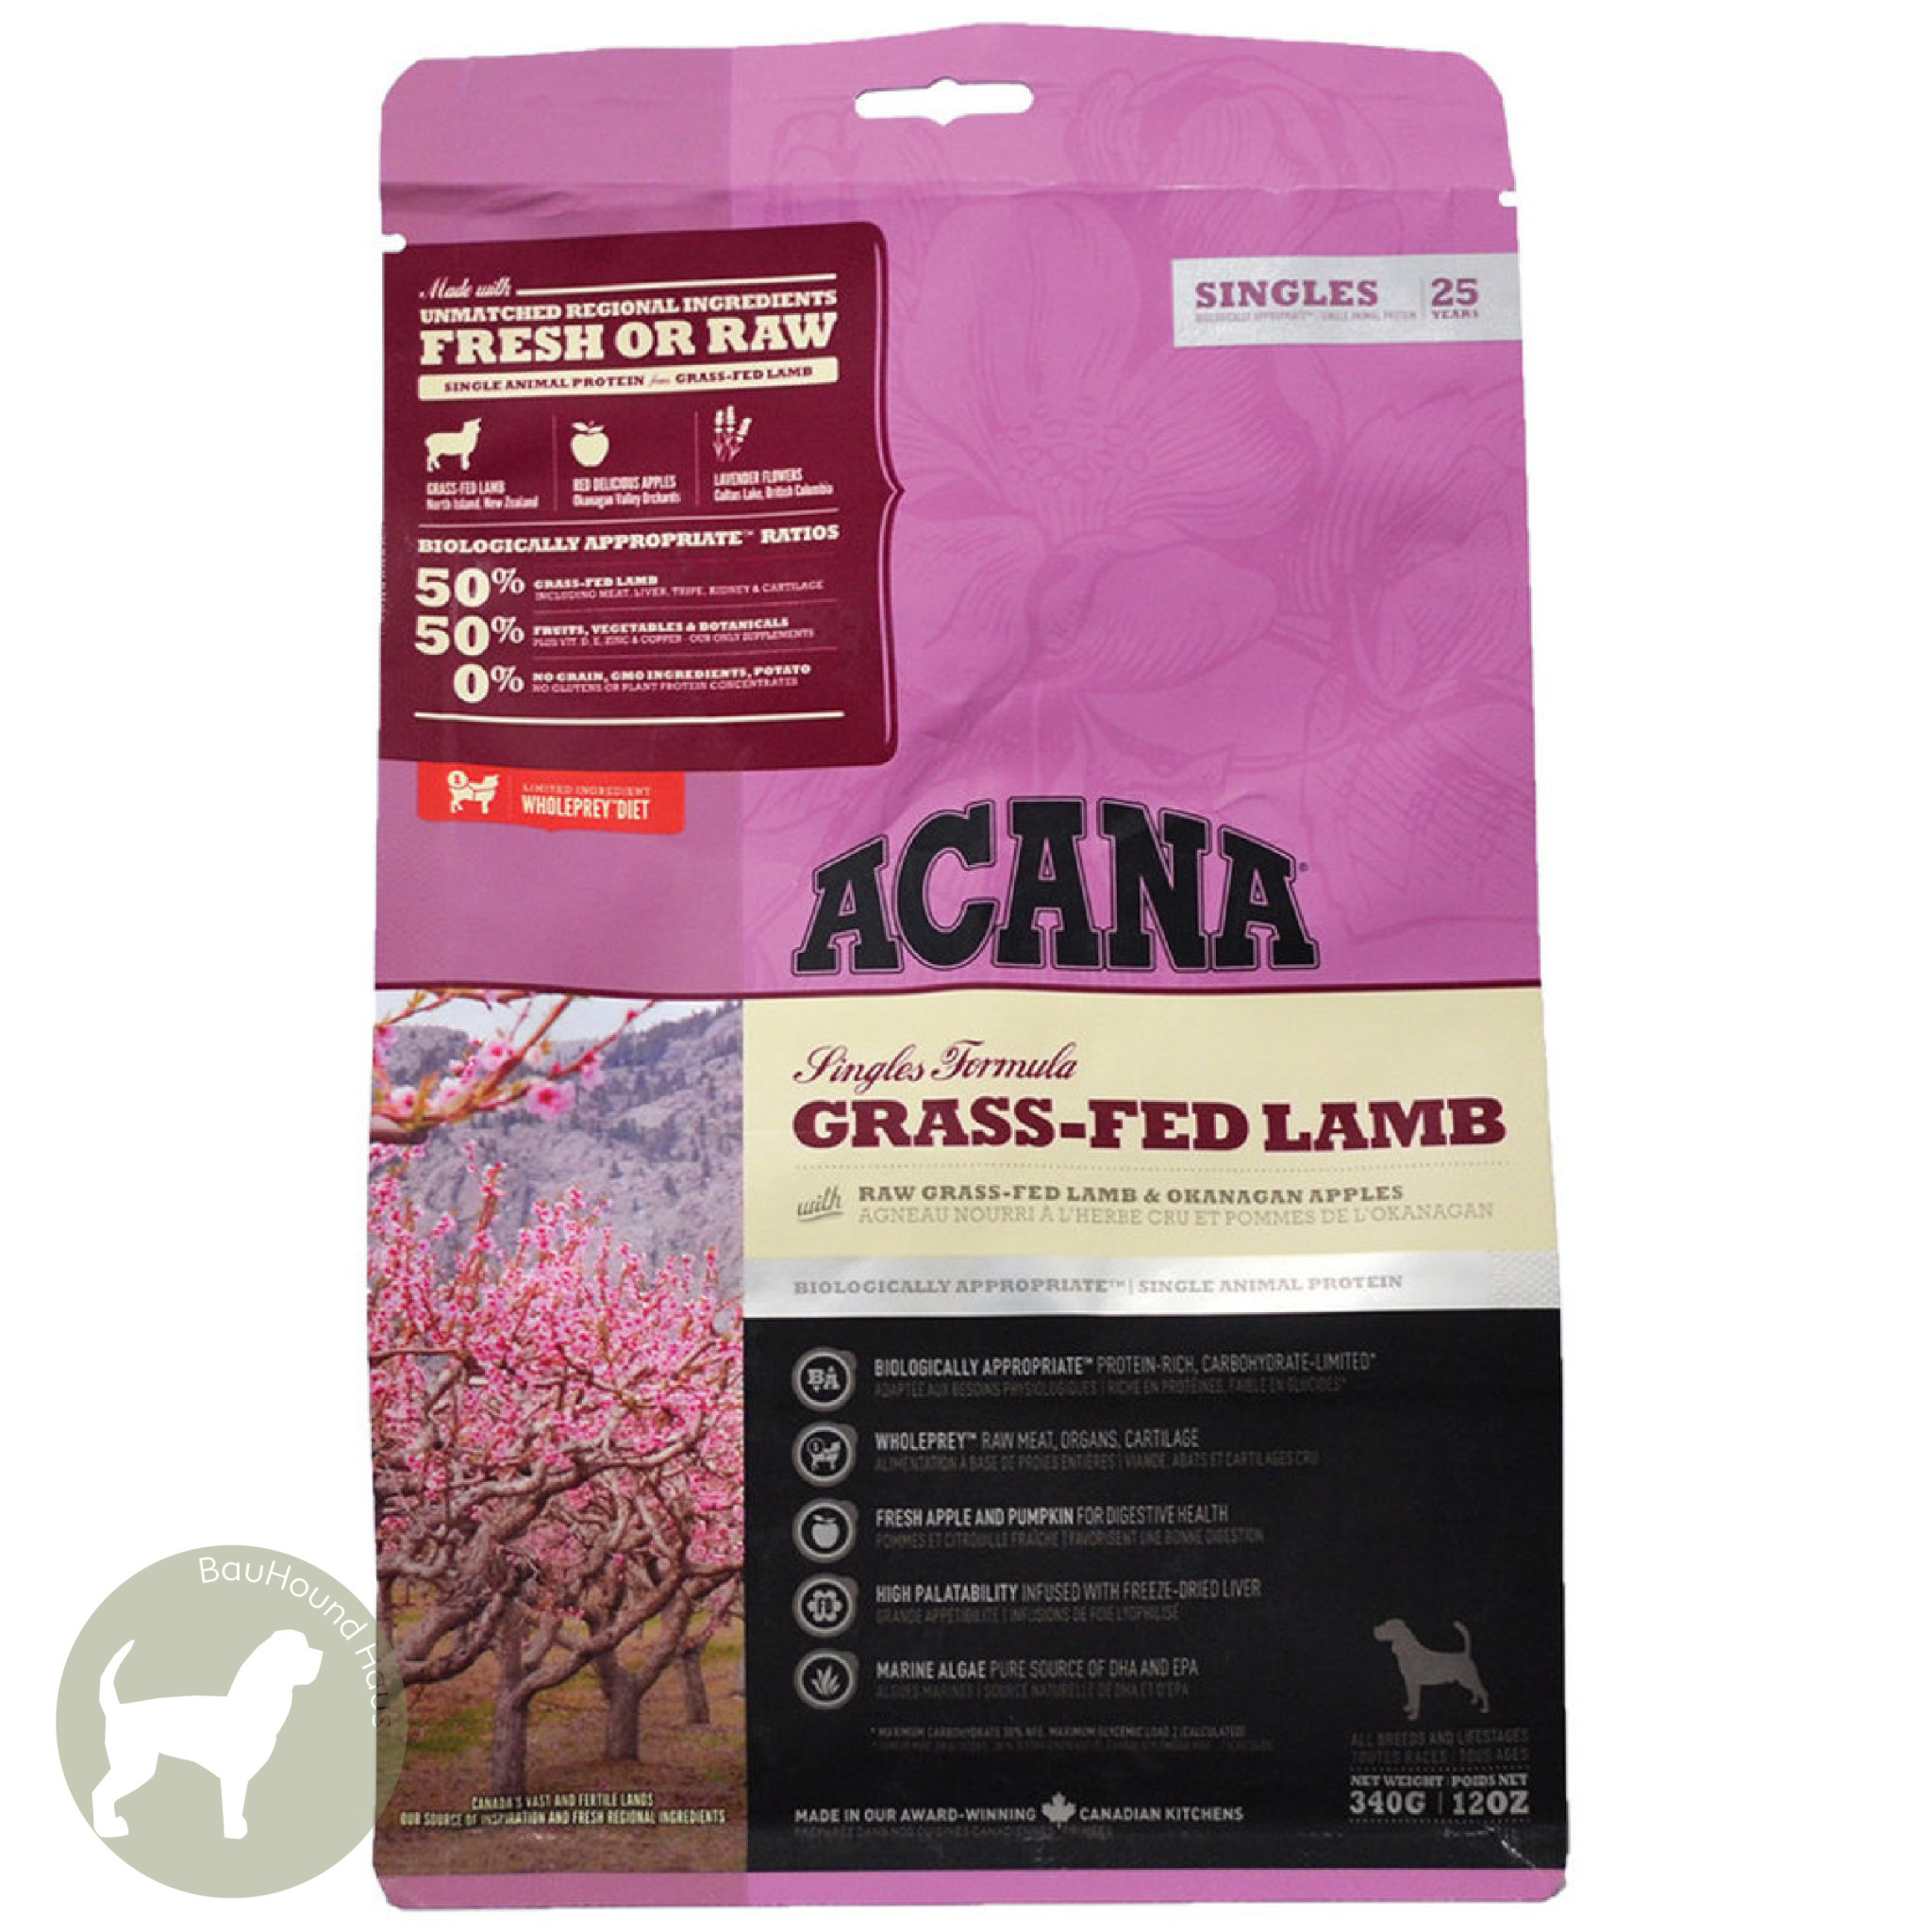 Acana Acana SINGLES Grain Free Grass Fed Lamb Kibble, 1.8kg